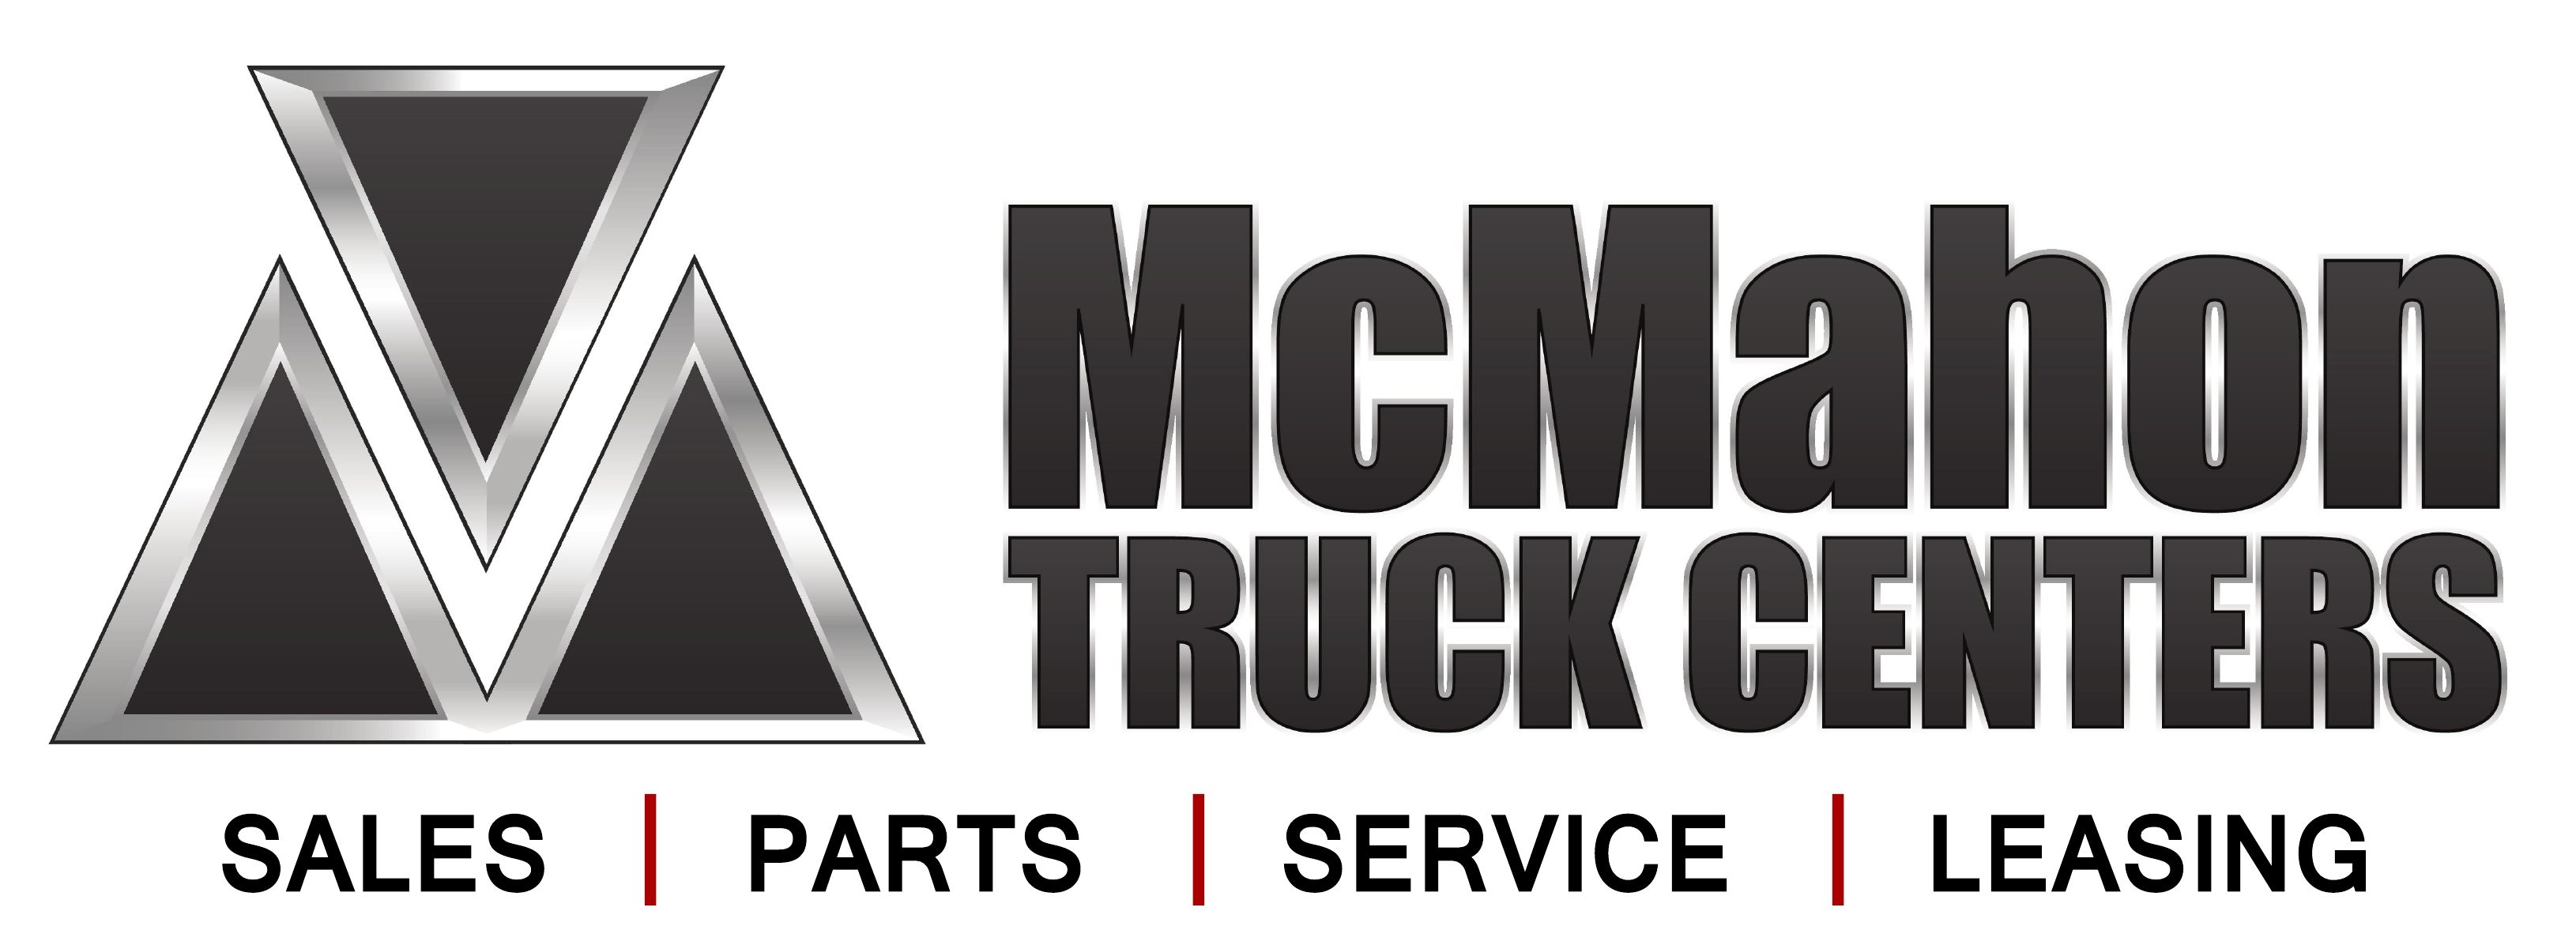 McMahon_logo_revised.jpg